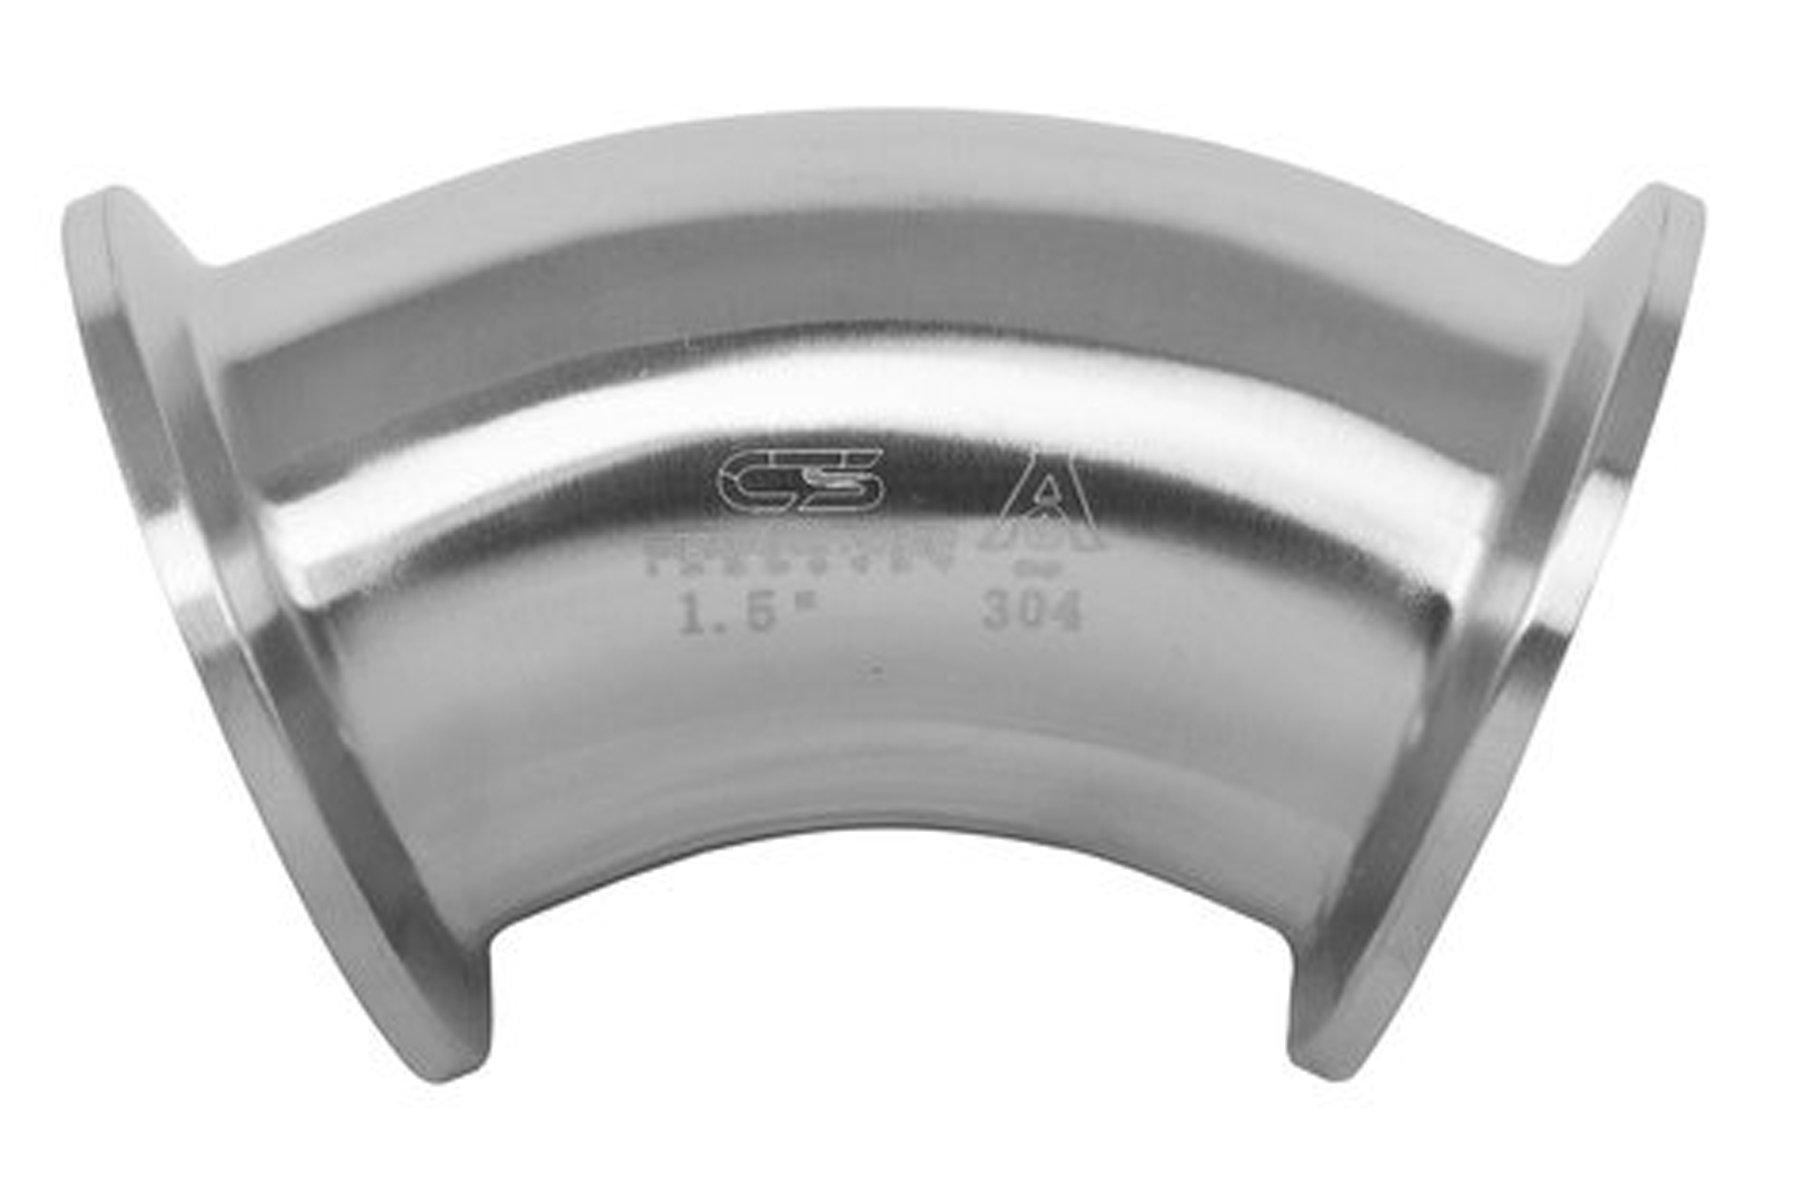 4'' 45 Degree 304 Stainless Steel Sanitary Ferrule Elbow Tri Clamp by Cedarstone Industry